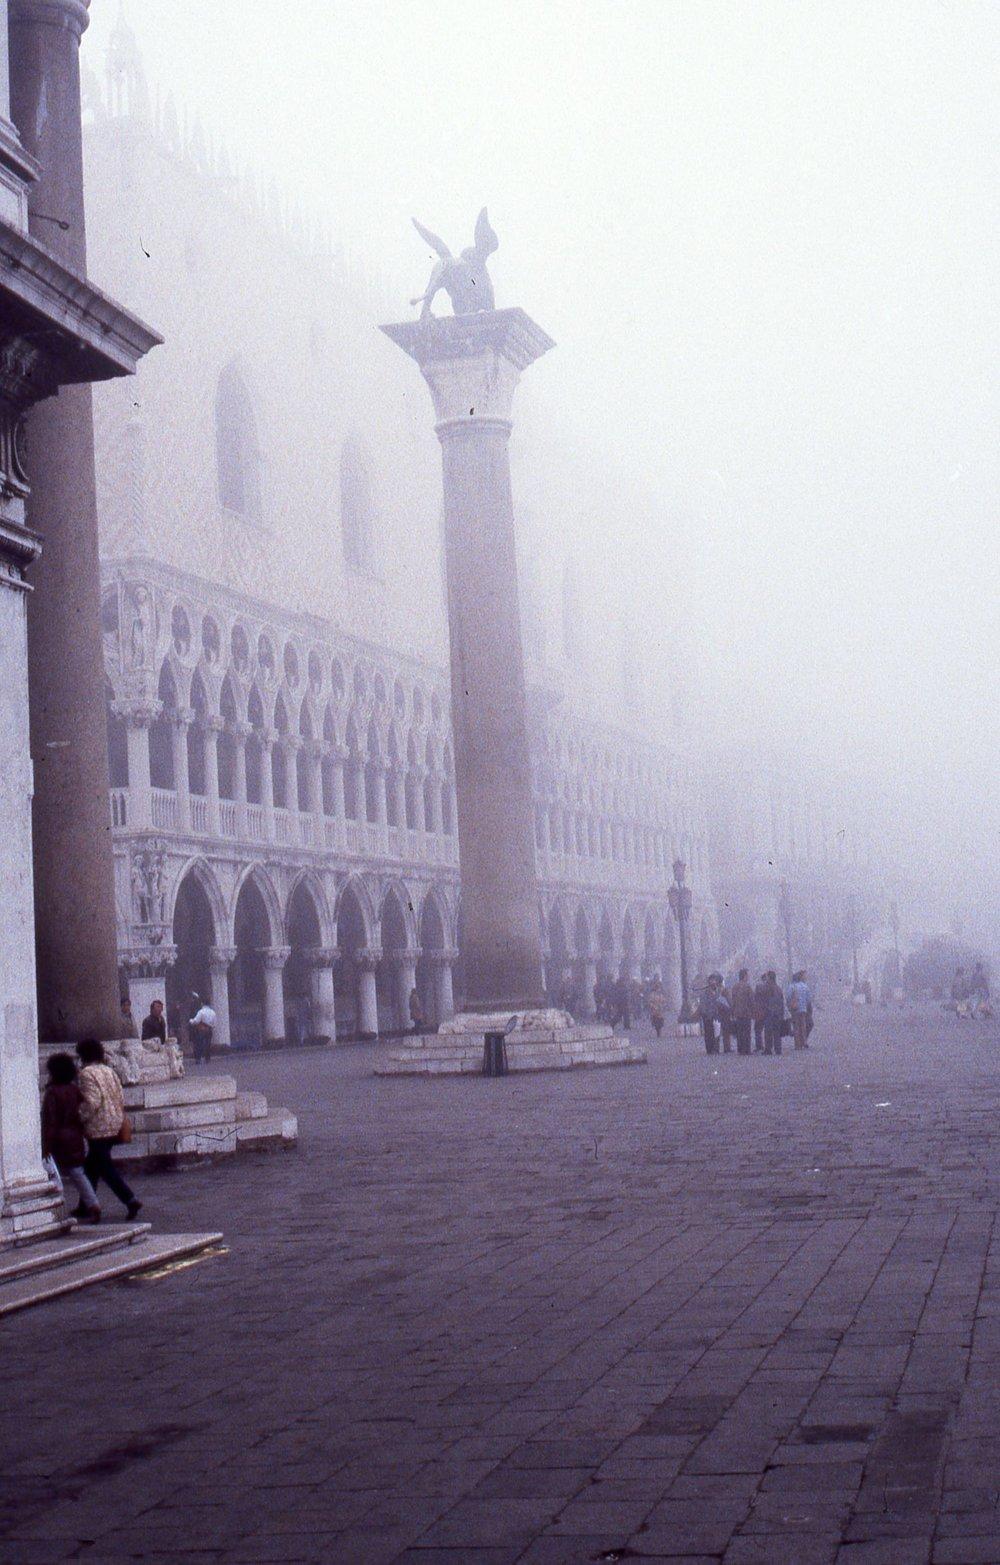 Venice | Venice in winter | Doge's Palace | photo sandrine cohen